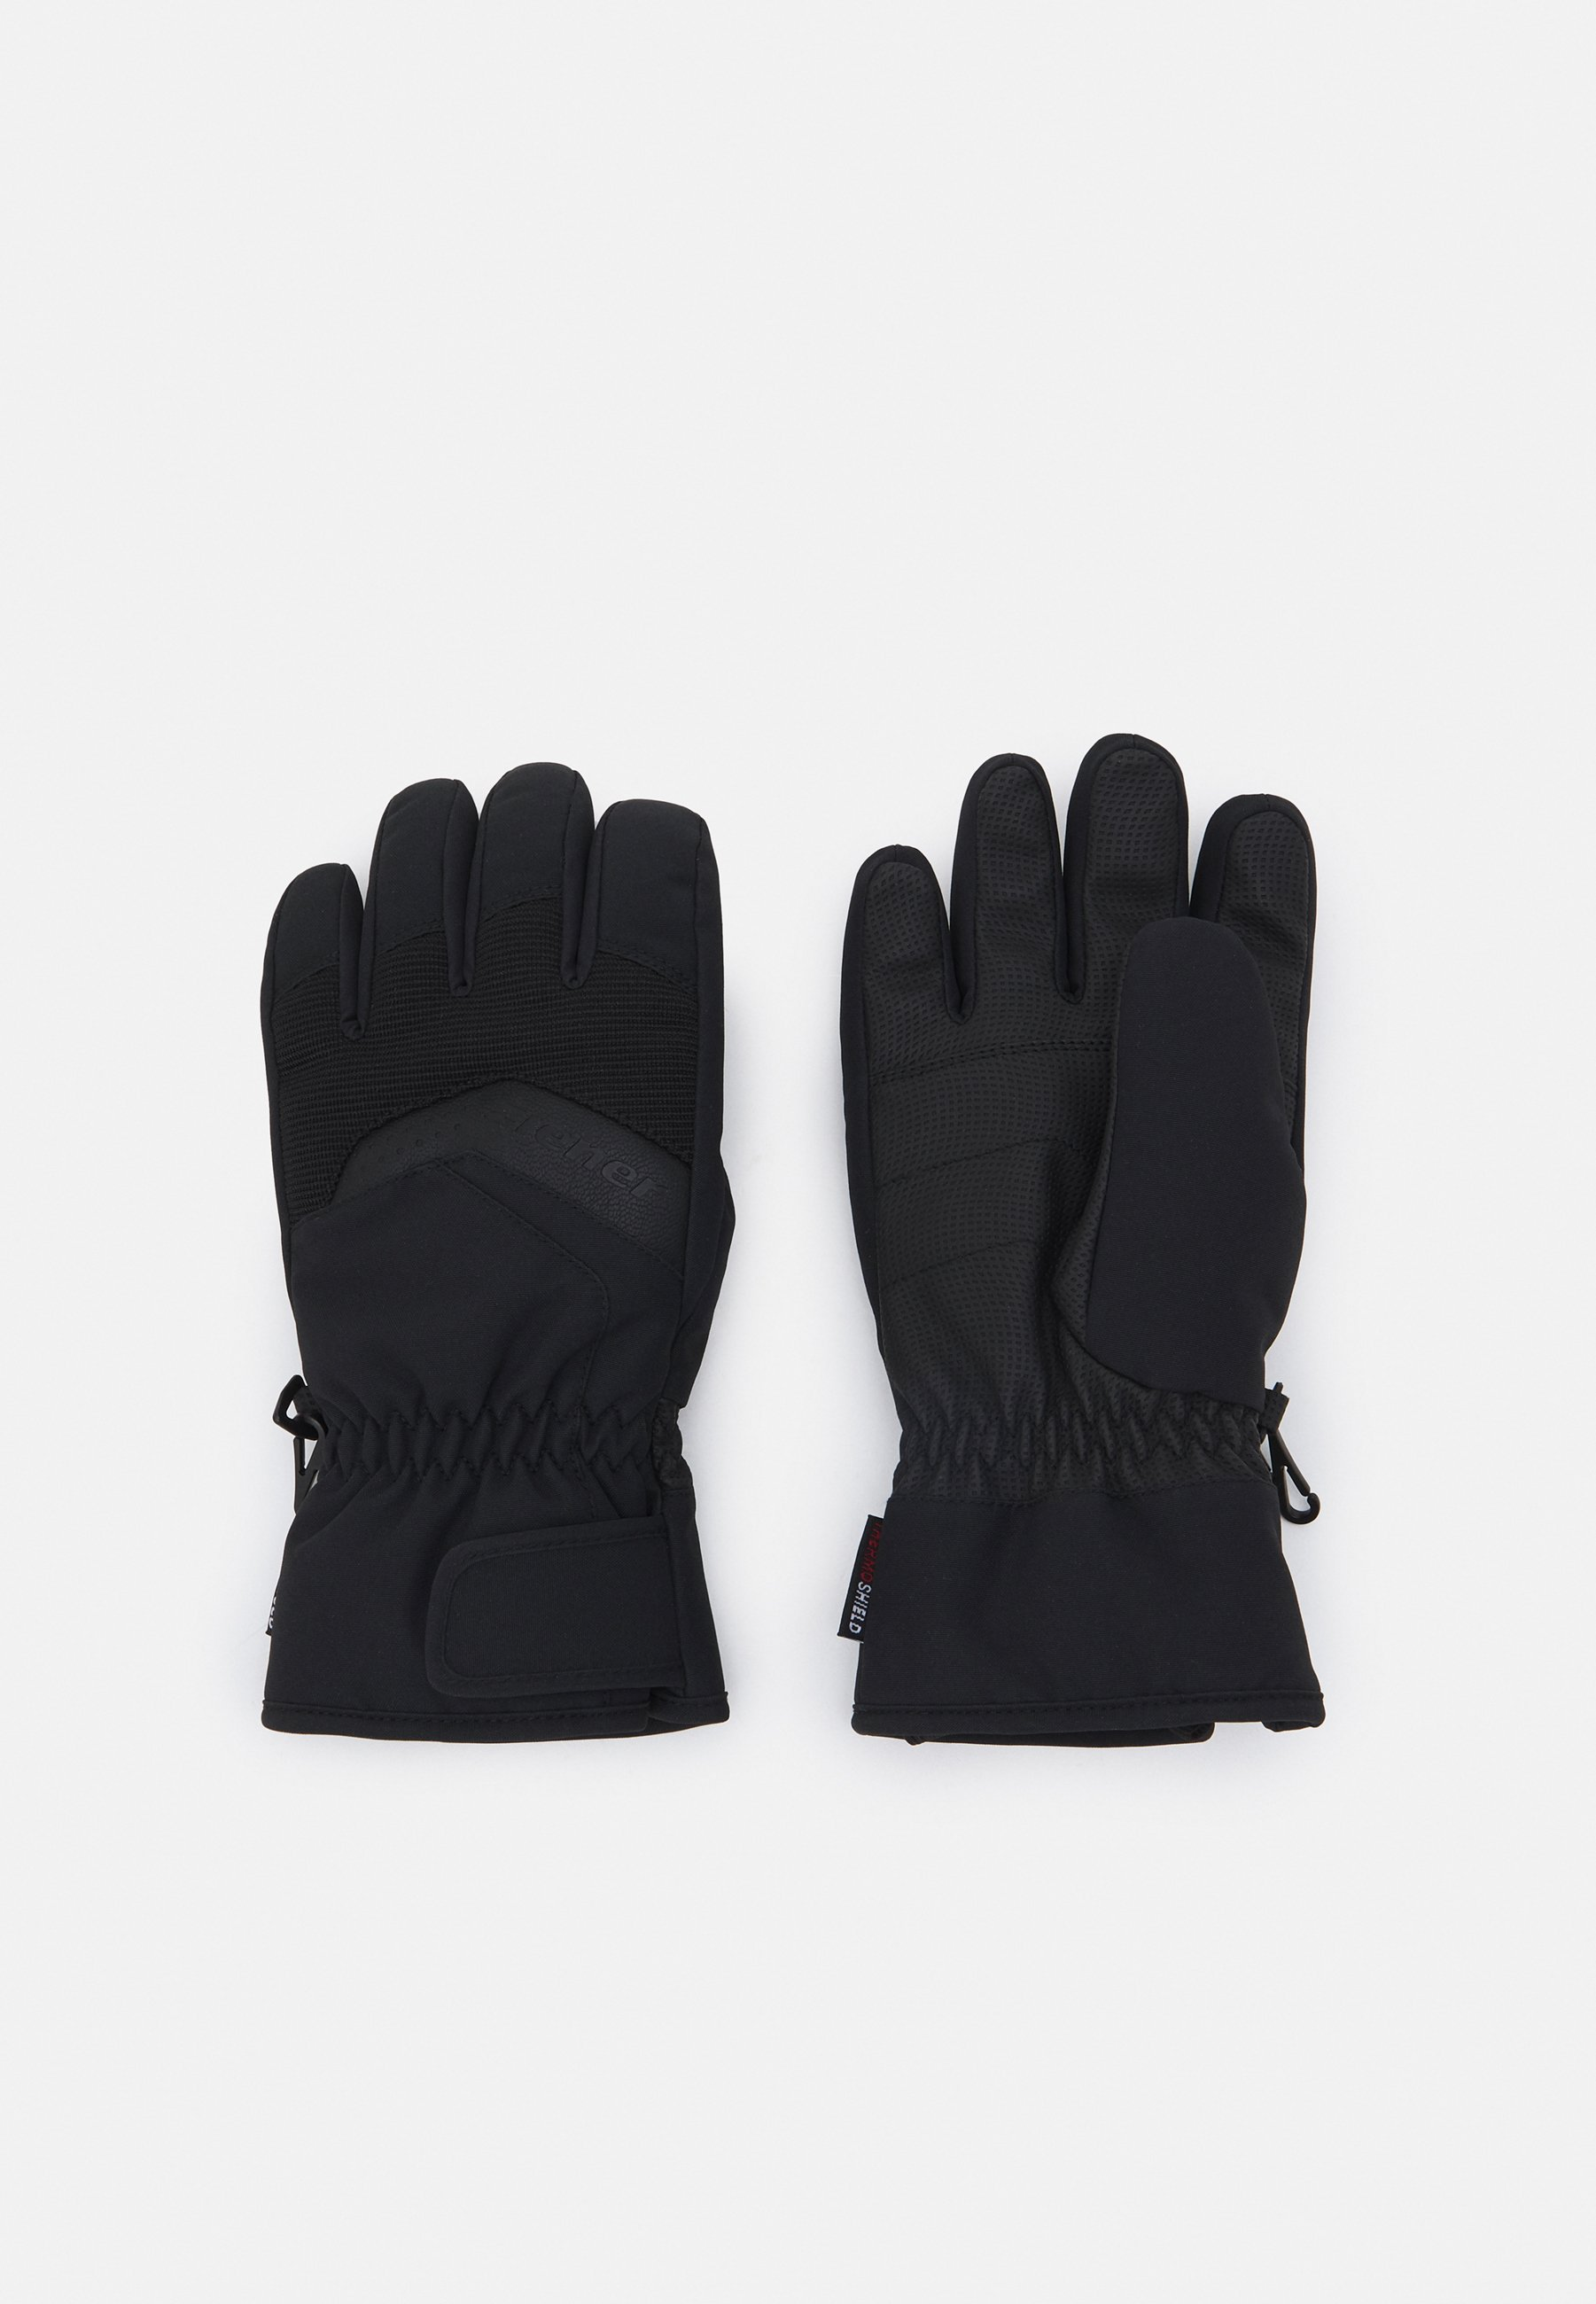 Kinder LABINO GLOVE JUNIOR UNISEX - Fingerhandschuh